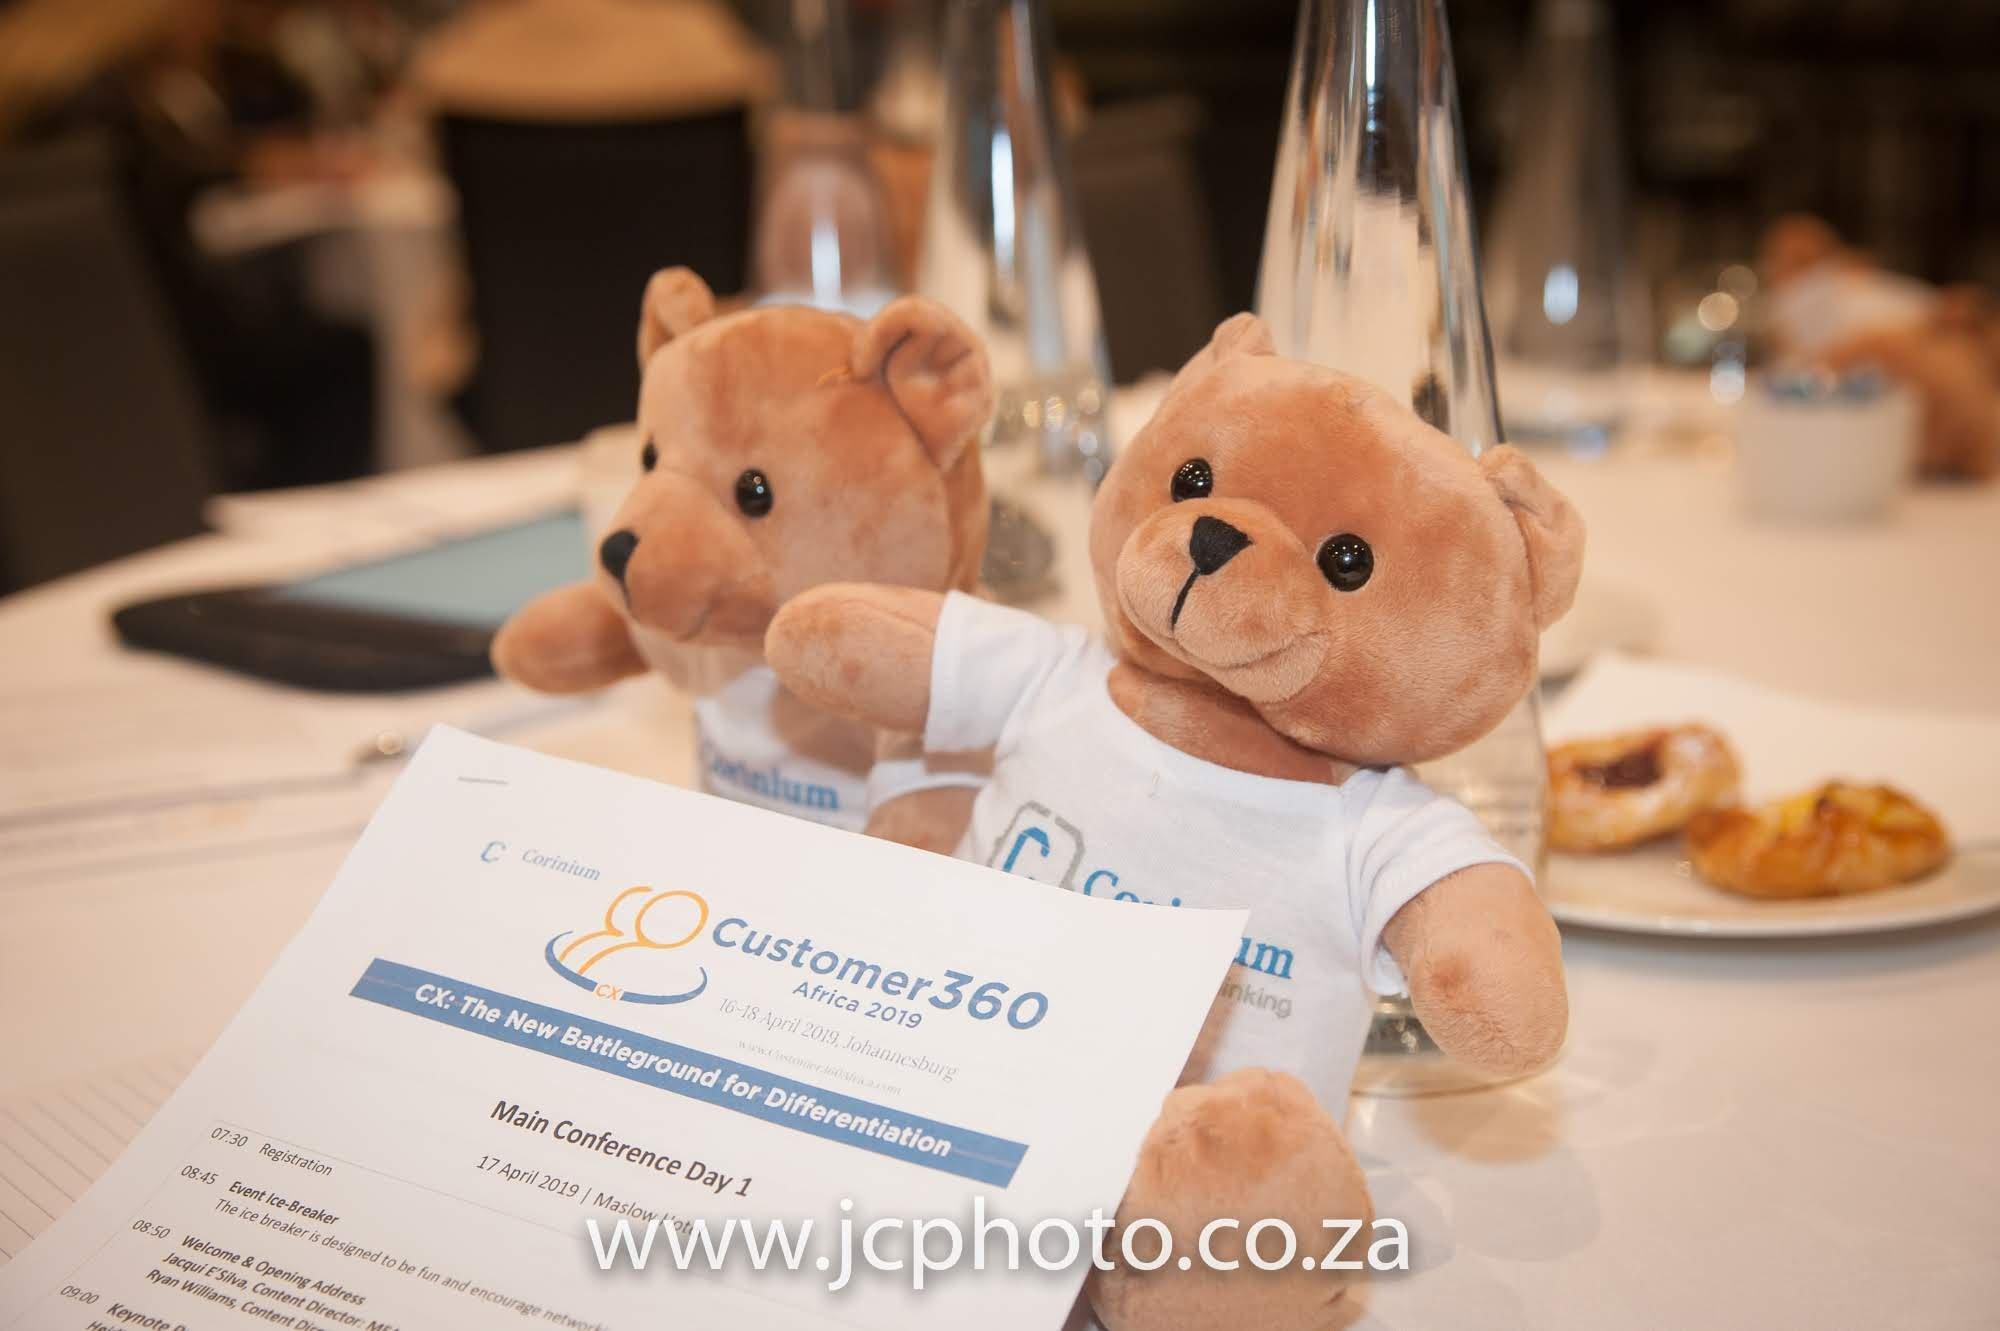 c360 bears